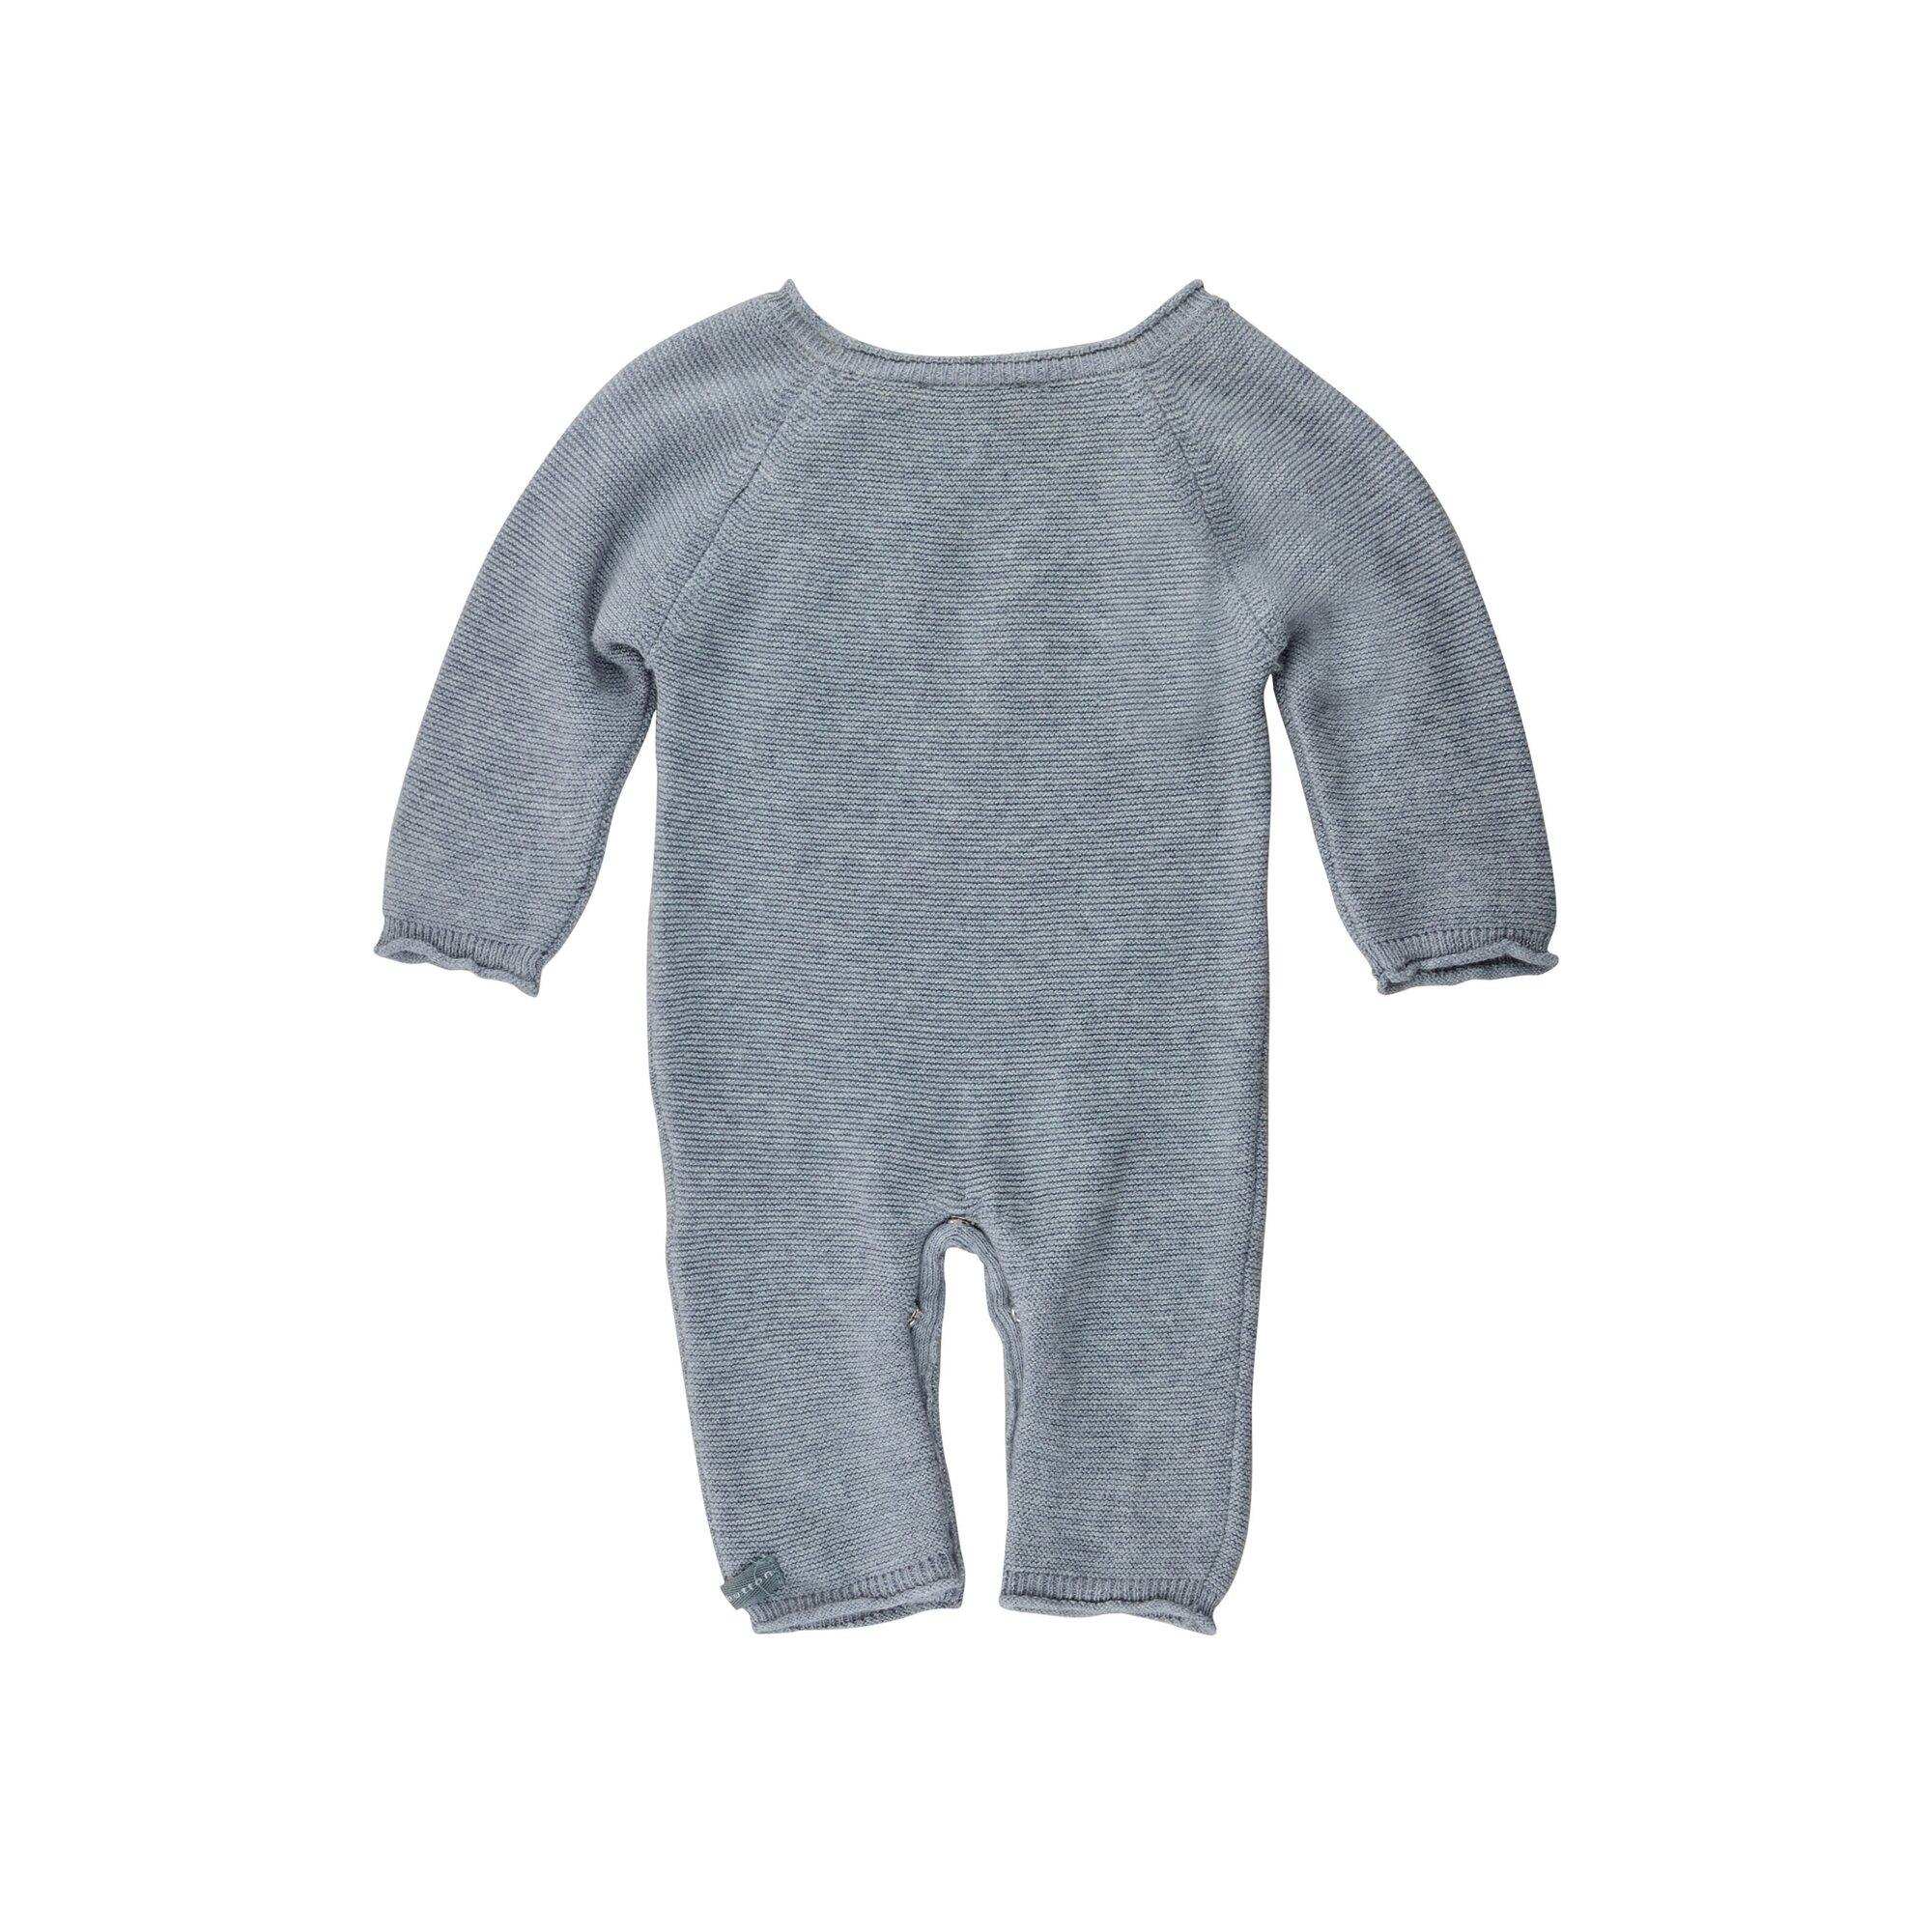 bellybutton-babystrampler-strick-mit-stern-grau-50-56-62-68-74, 39.95 EUR @ babywalz-de